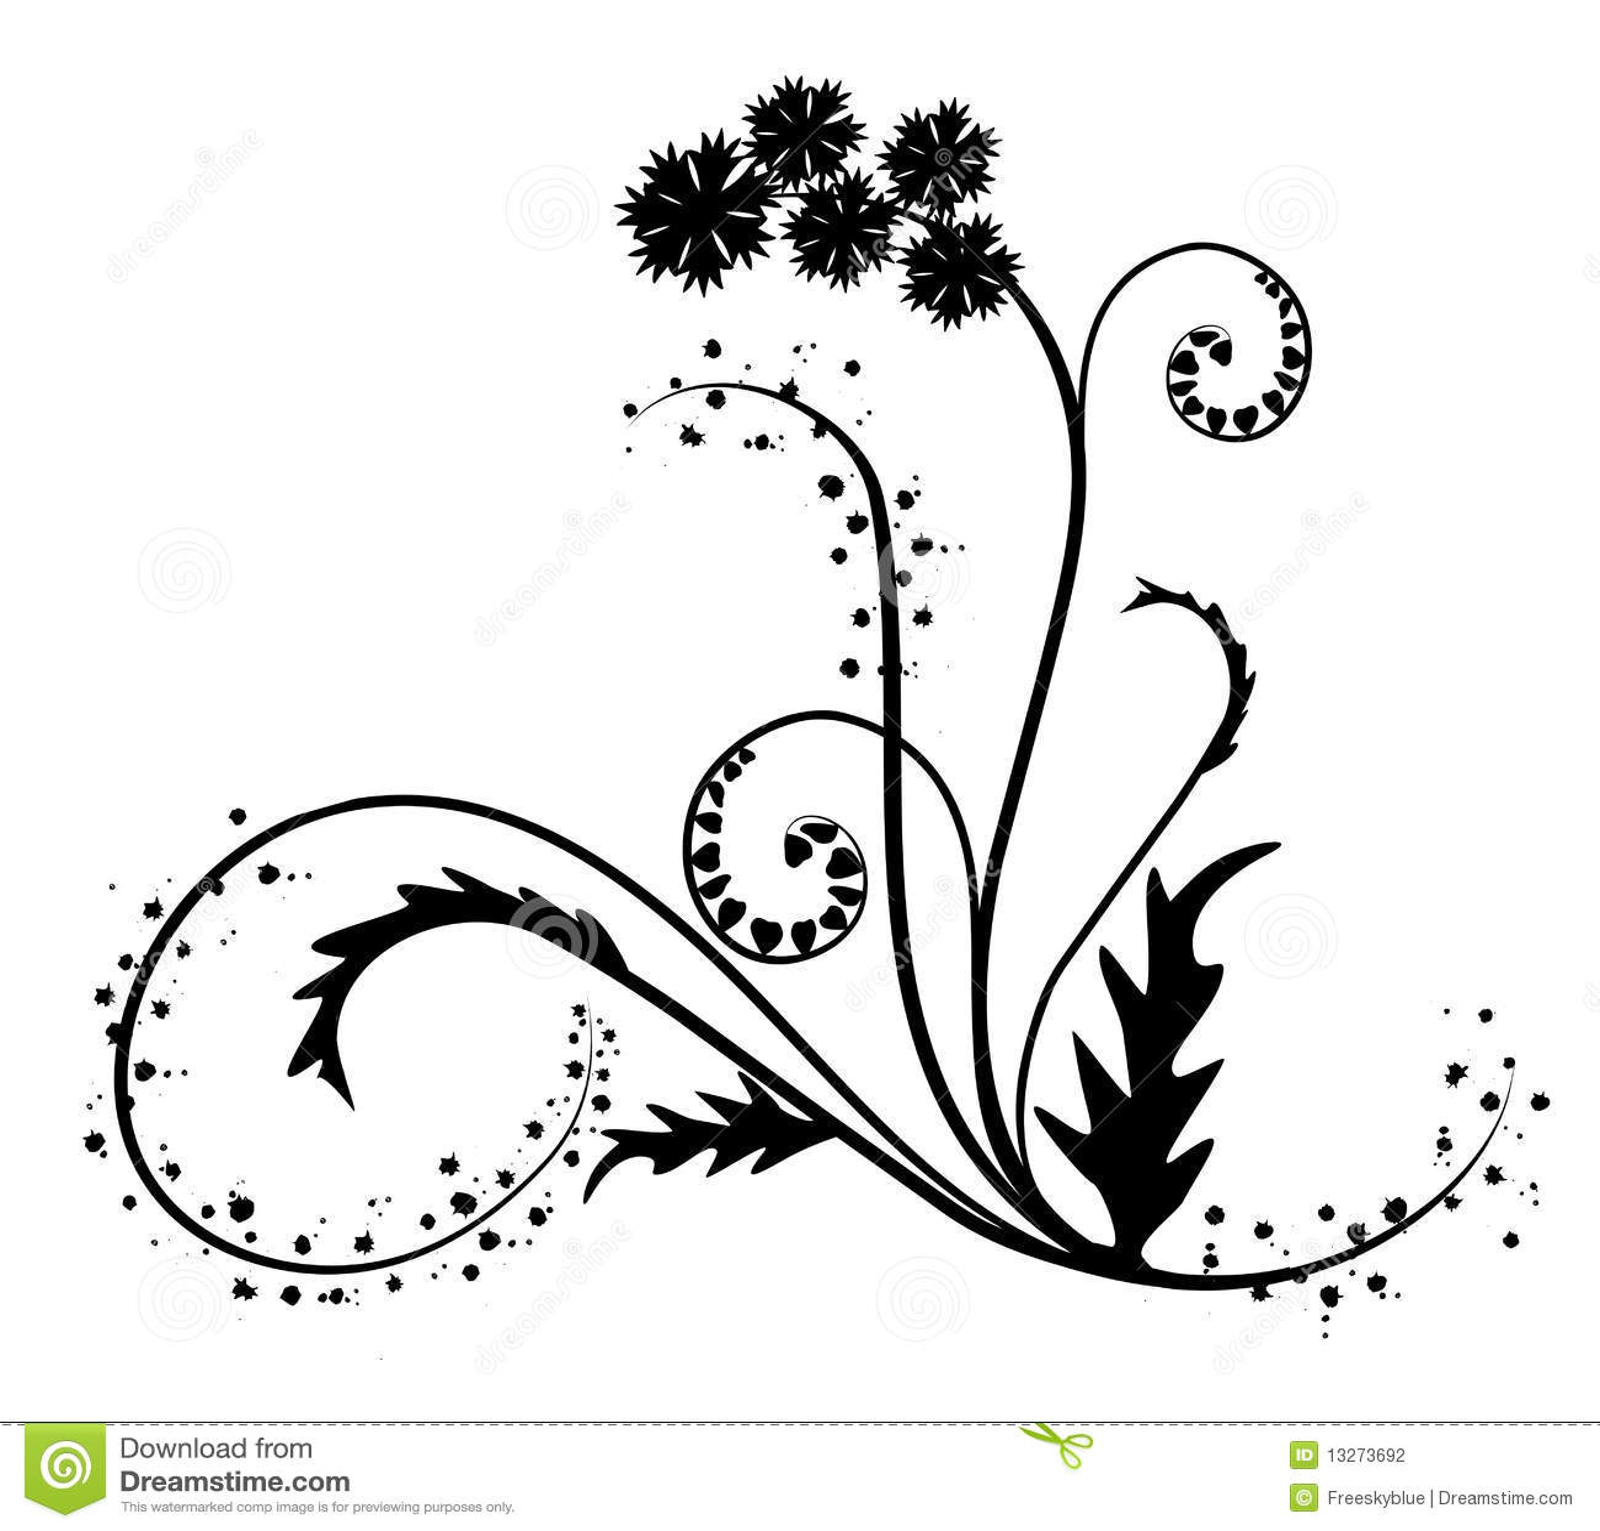 Black Flower Pattern Silhouette Stock Illustration: Silhouette Of Black Flower Pattern Stock Illustration